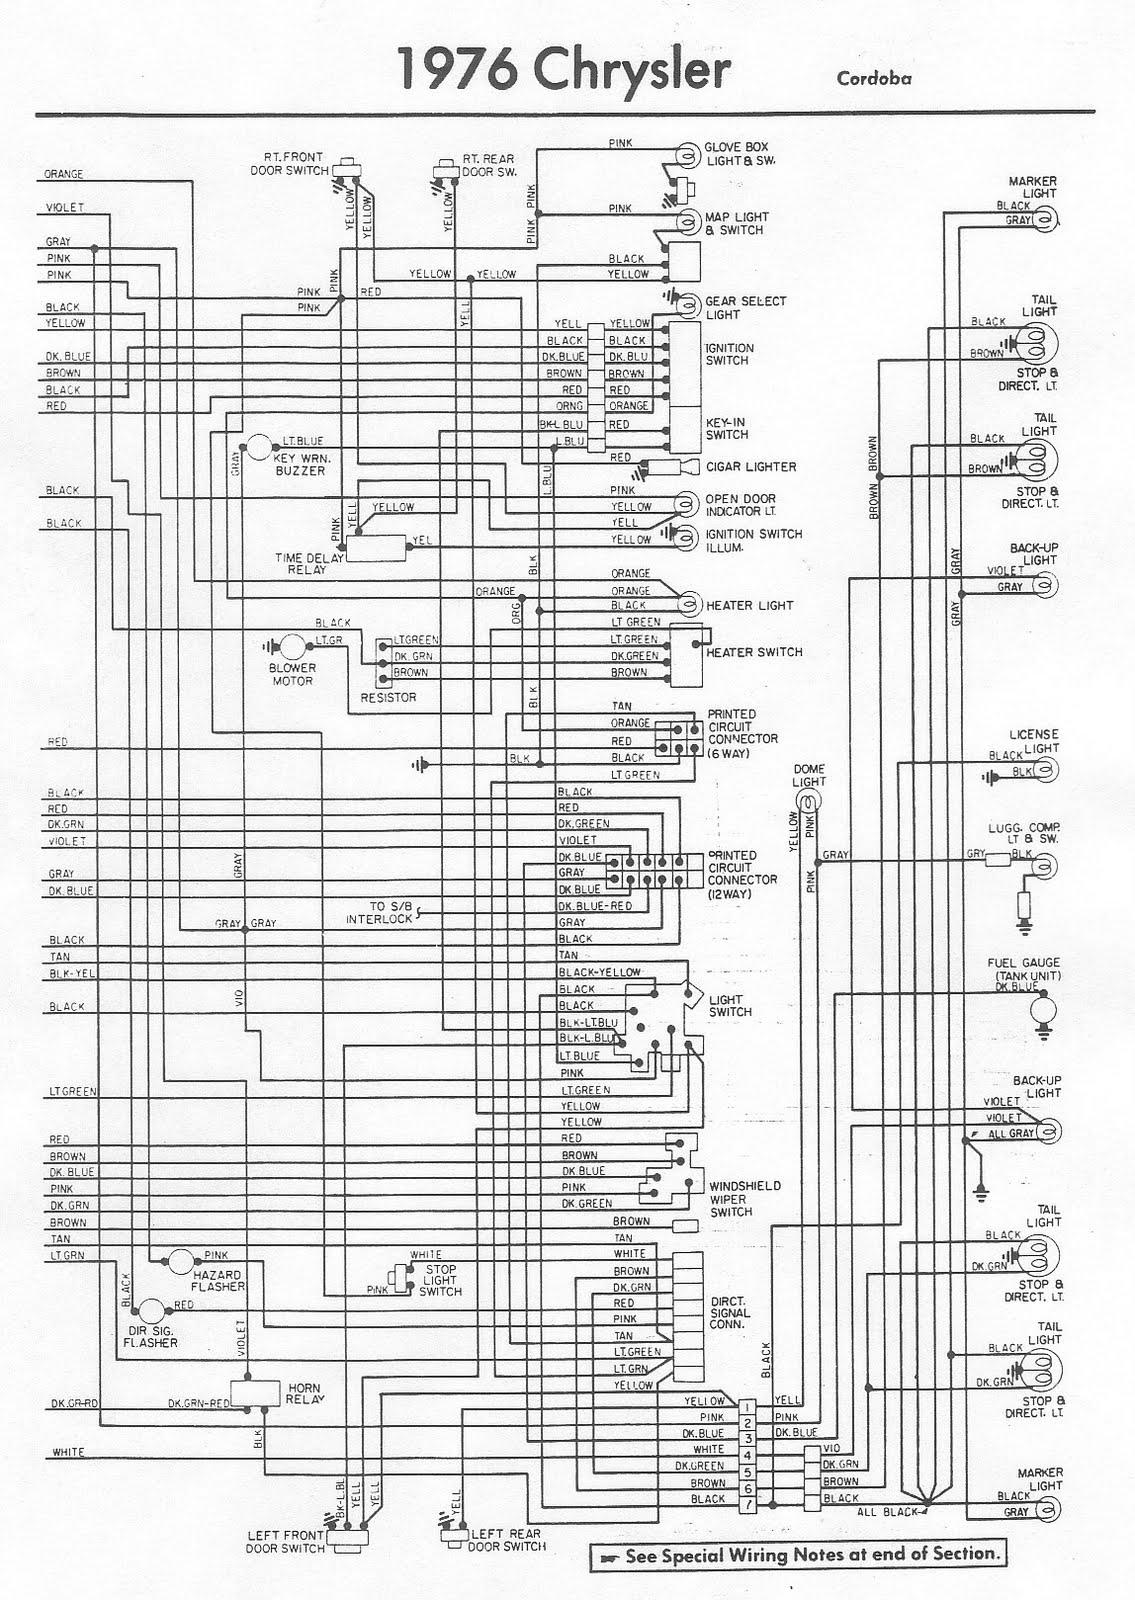 1976 Chrysler Cordoba Stromkreis Diagramm Bordz | Führung Reparatur